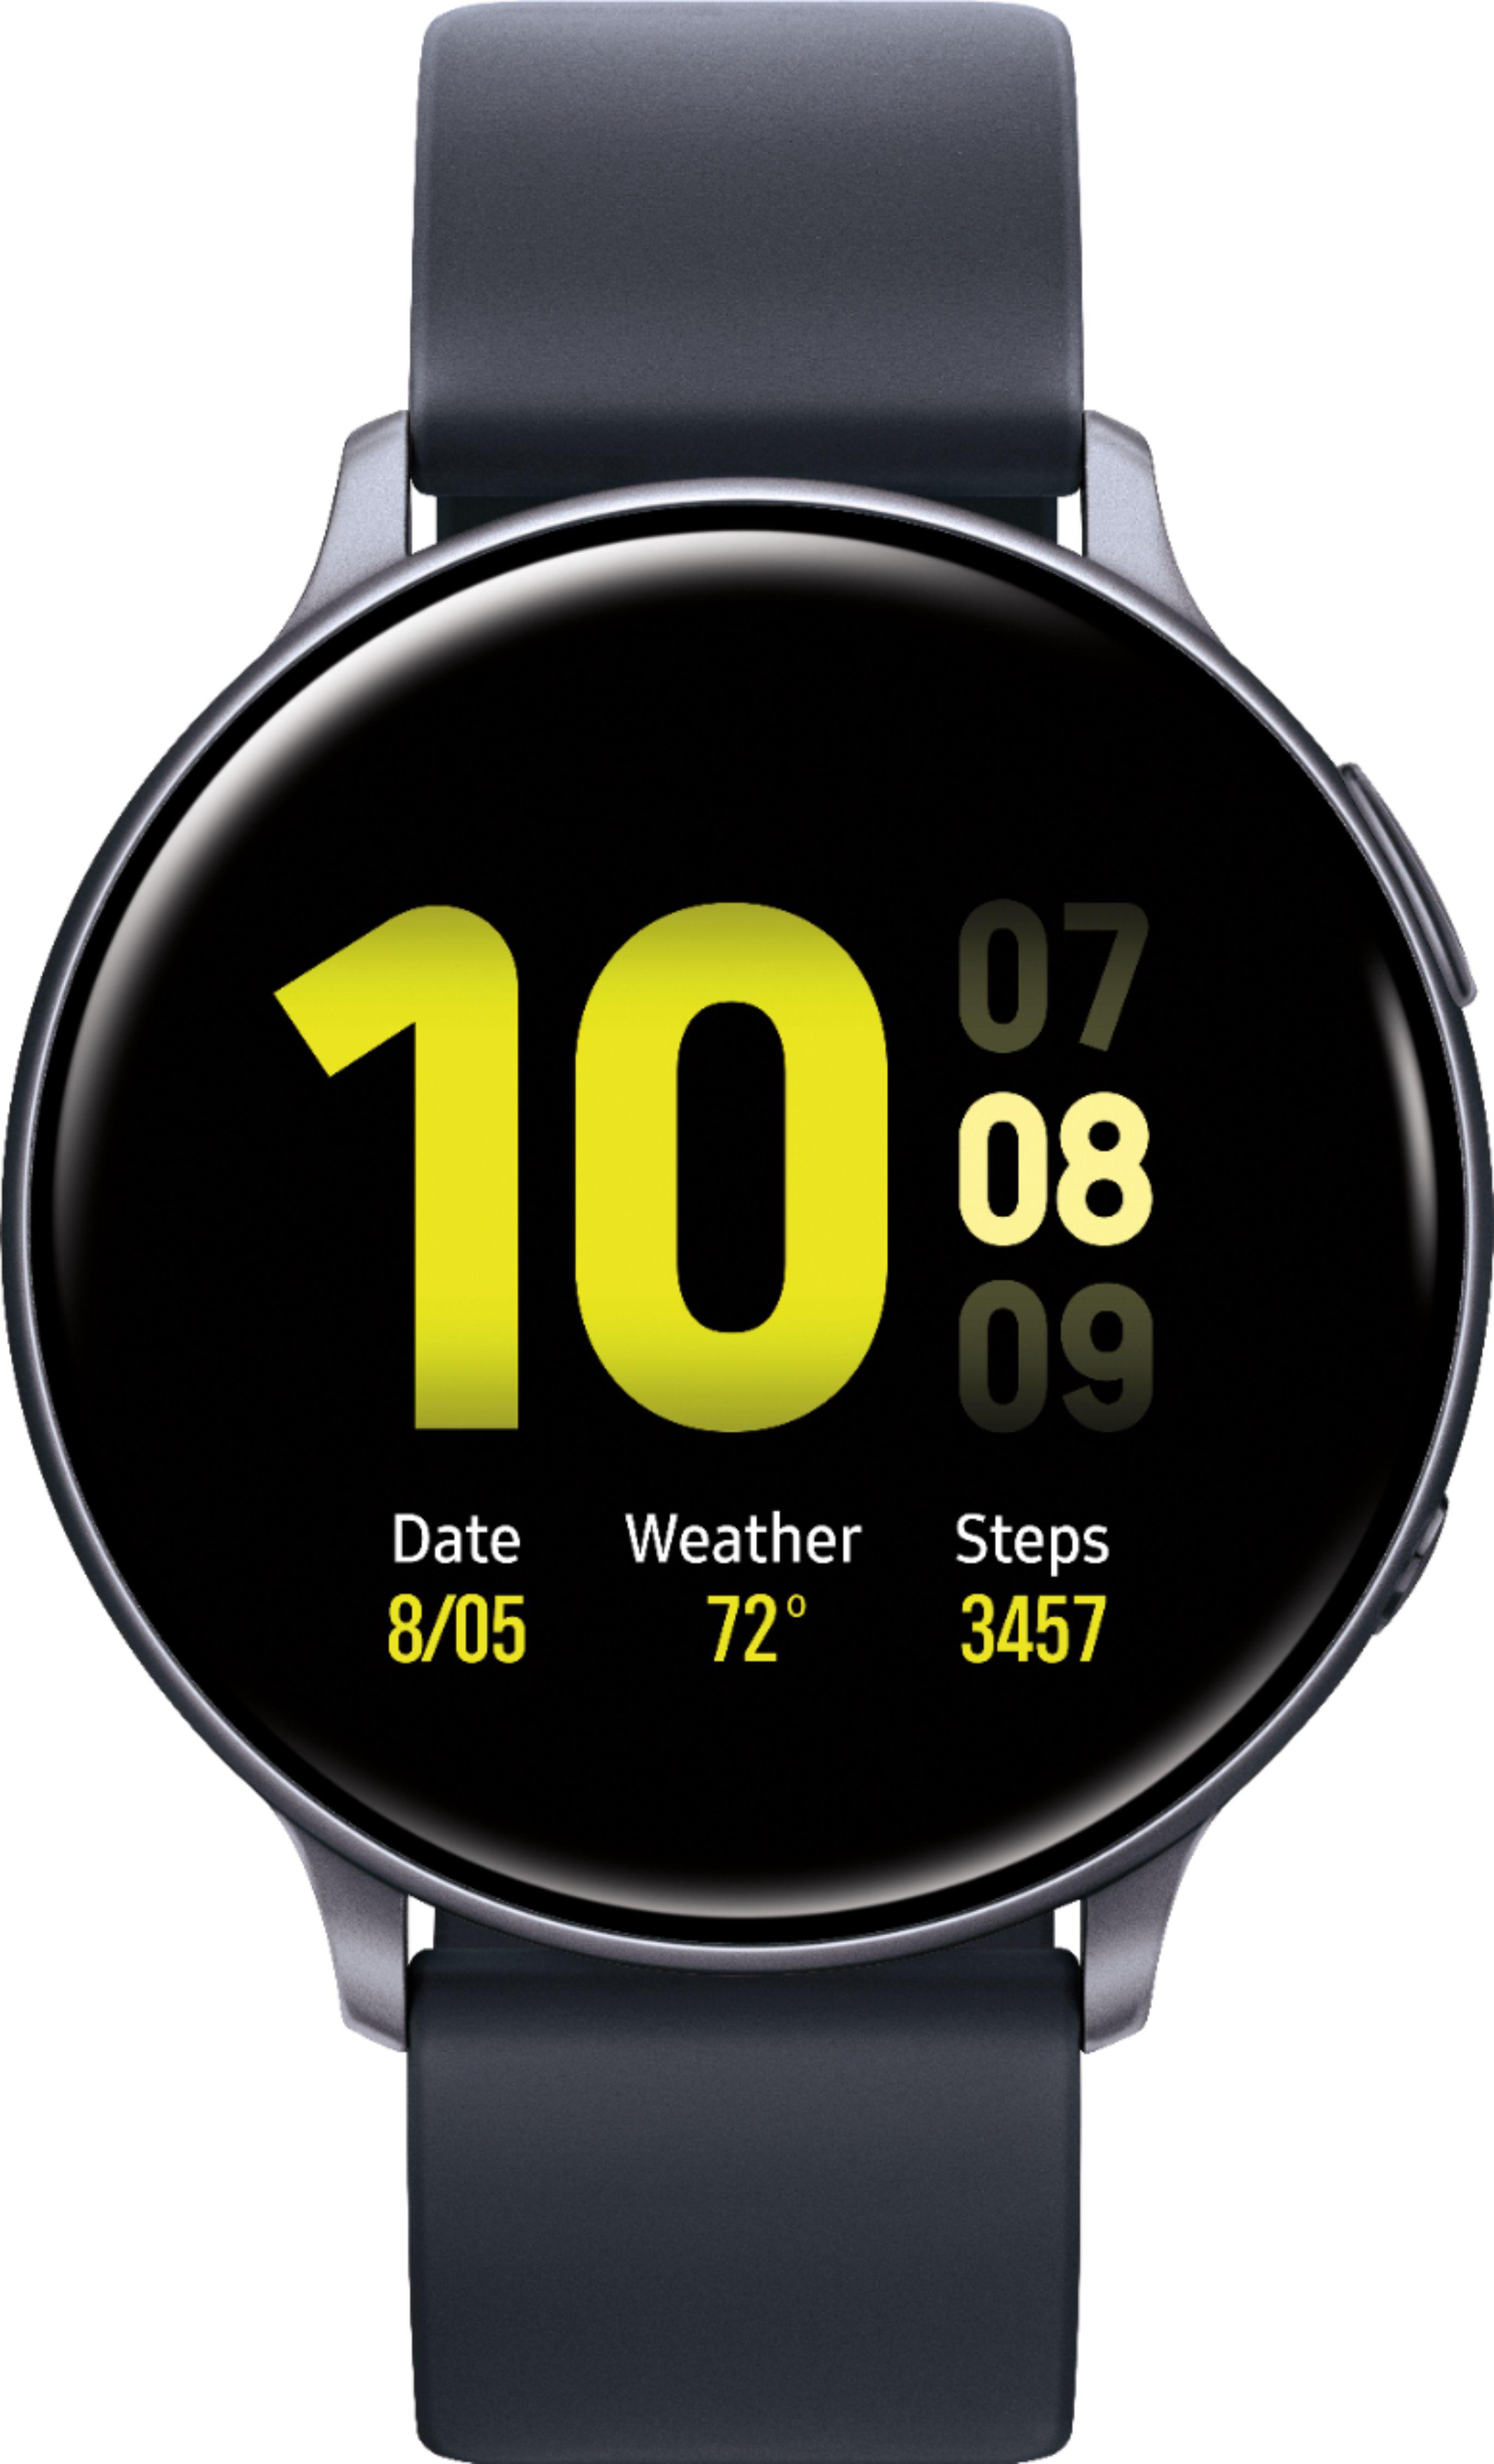 Samsung Galaxy Active 2 Watch Image